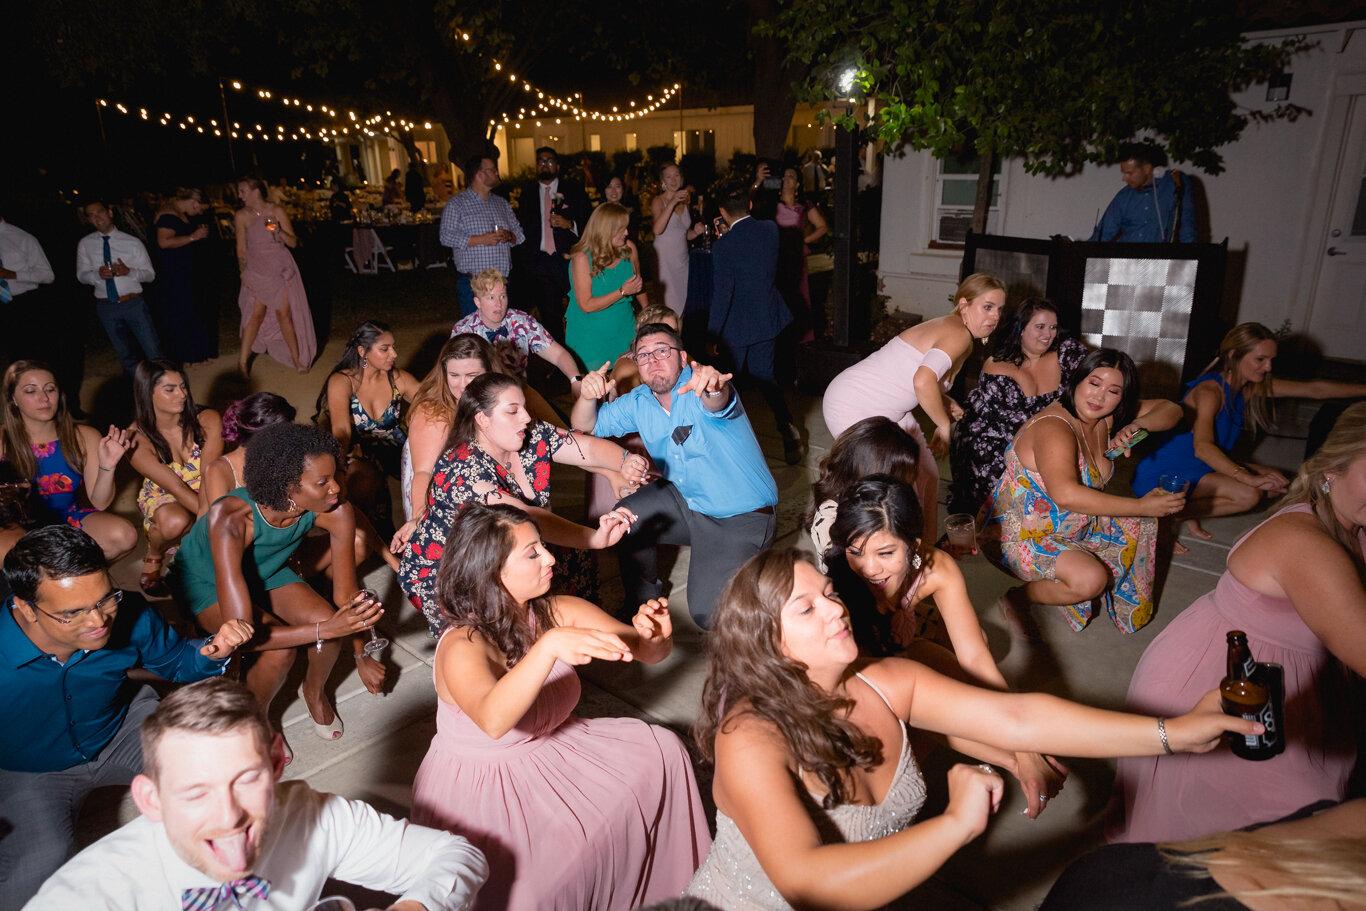 2019.08.24_Emily-Ashir-Wedding-at-the-Maples-6556.jpg